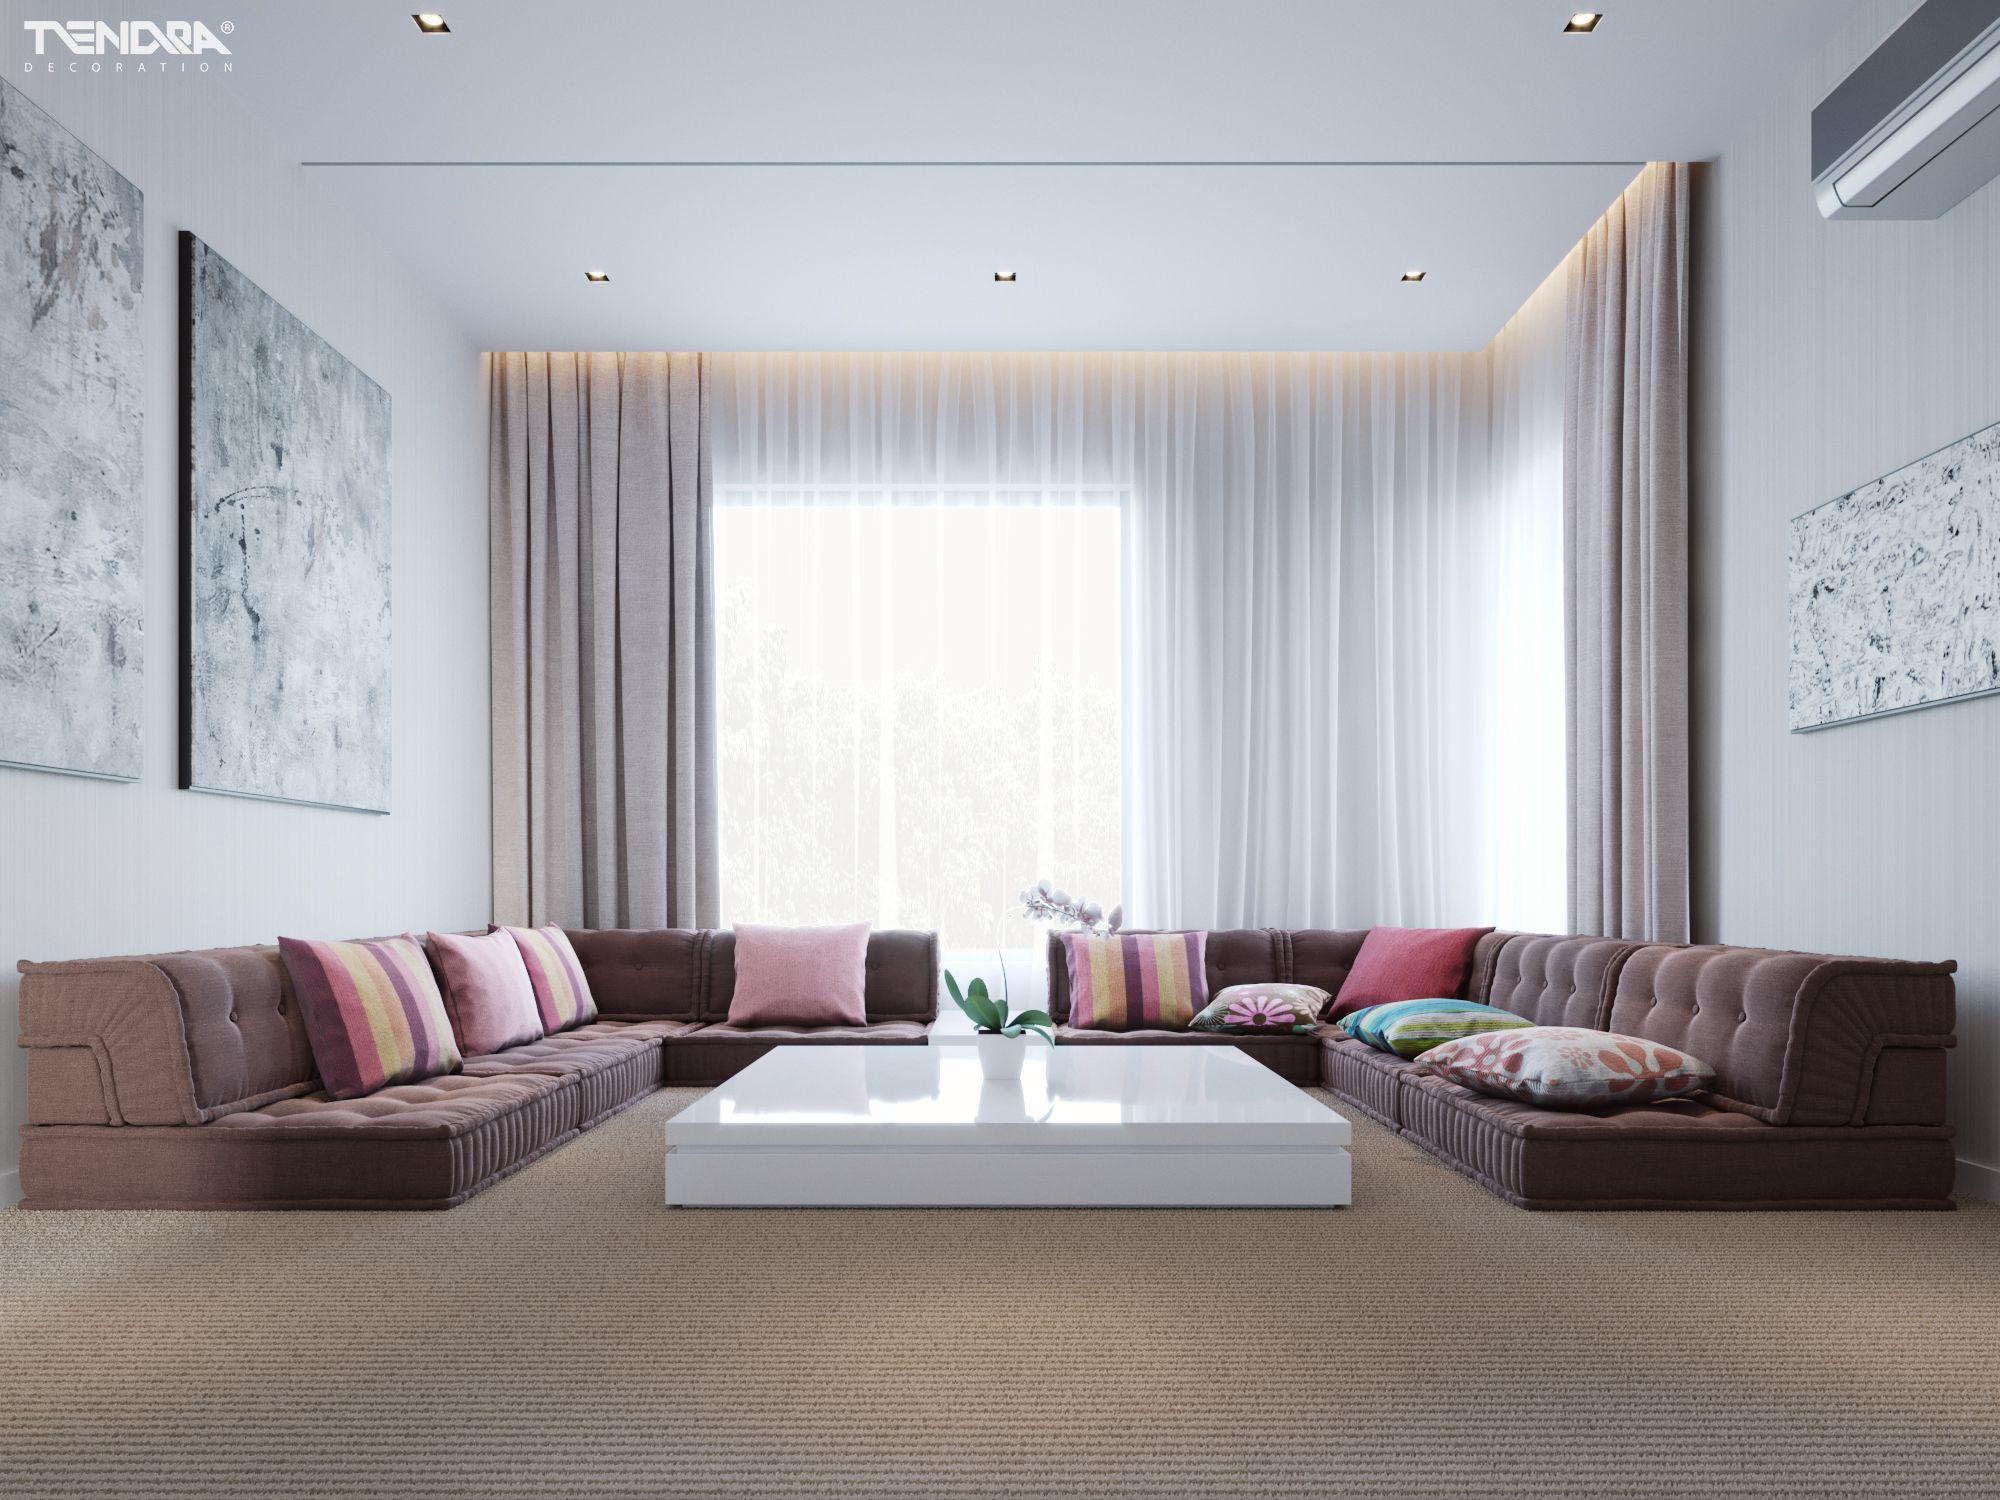 Na Villa Floor Seating Living Room Living Room Design Decor Modern Furniture Living Room